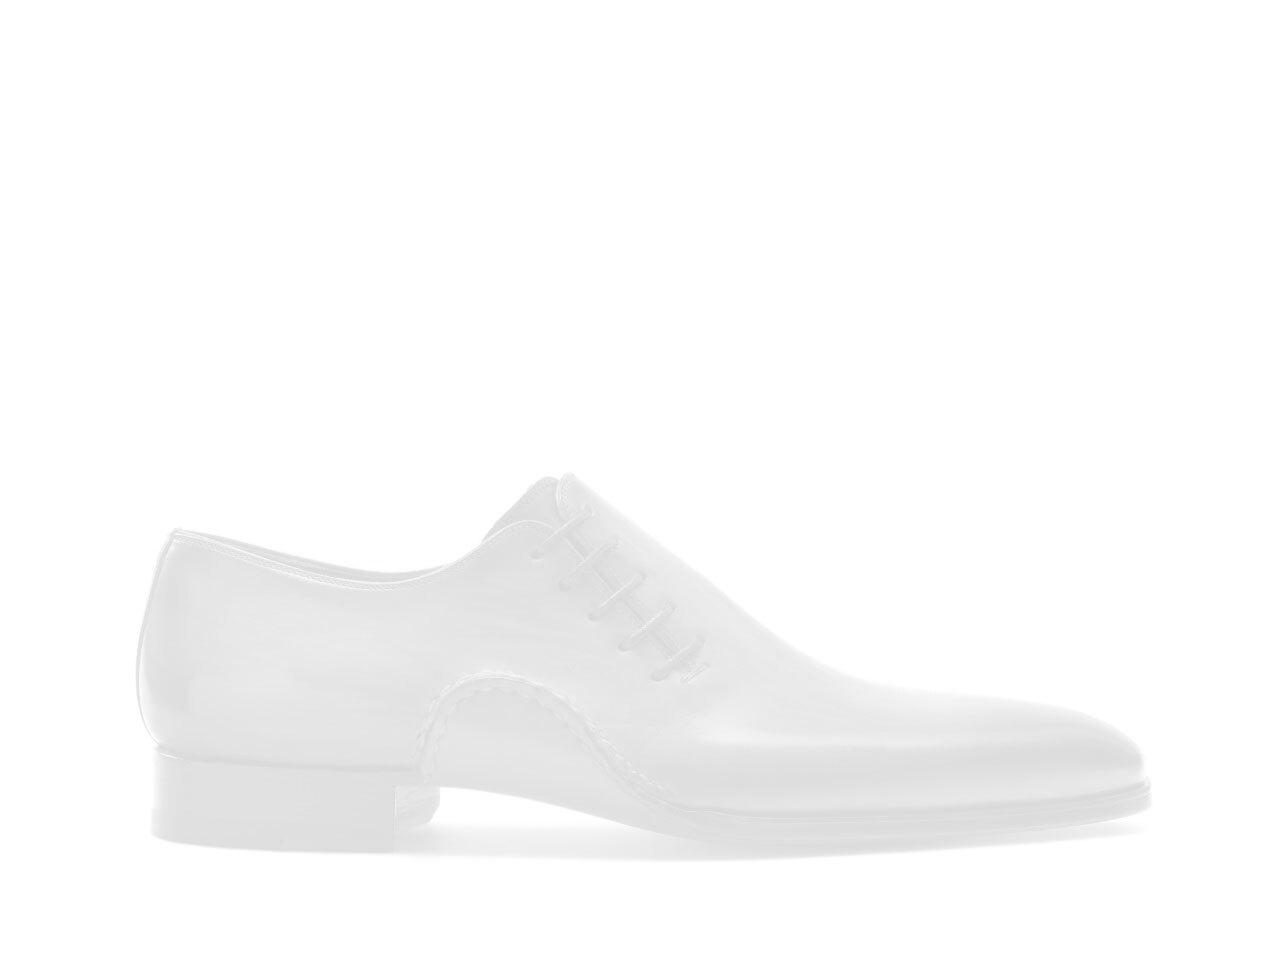 Side view of the Magnanni Saffron Wide Cuero Men's Oxford Shoes